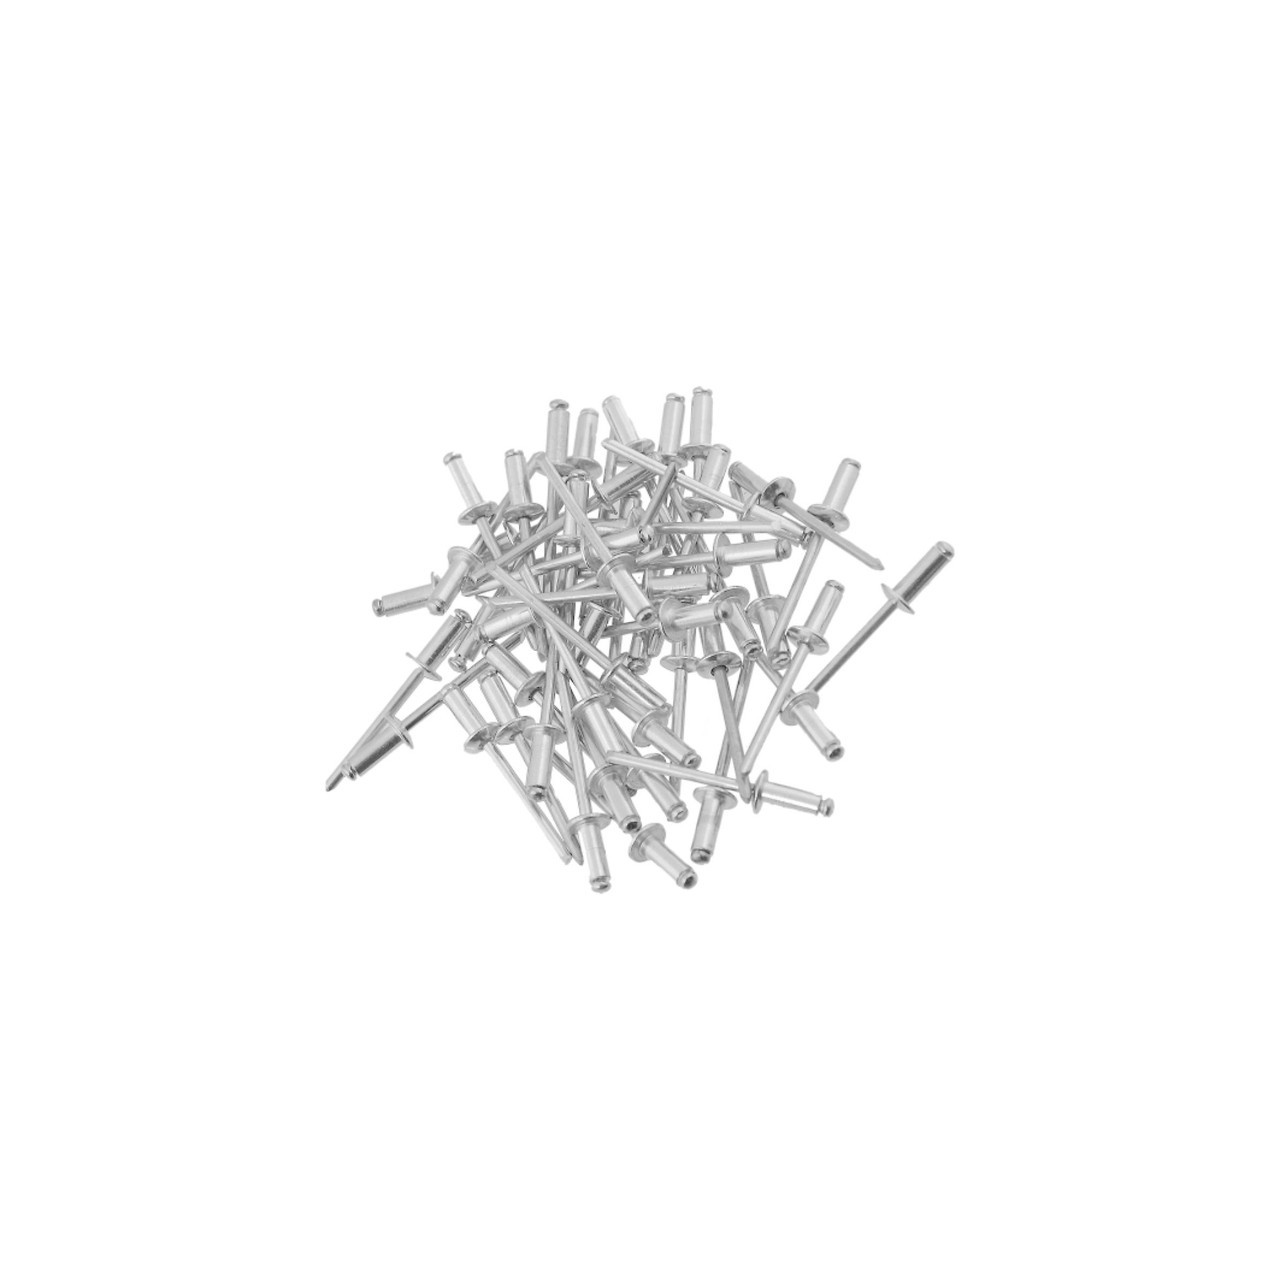 Заклепки  4,8х28 мм, 50 шт   FASTER TOOLS